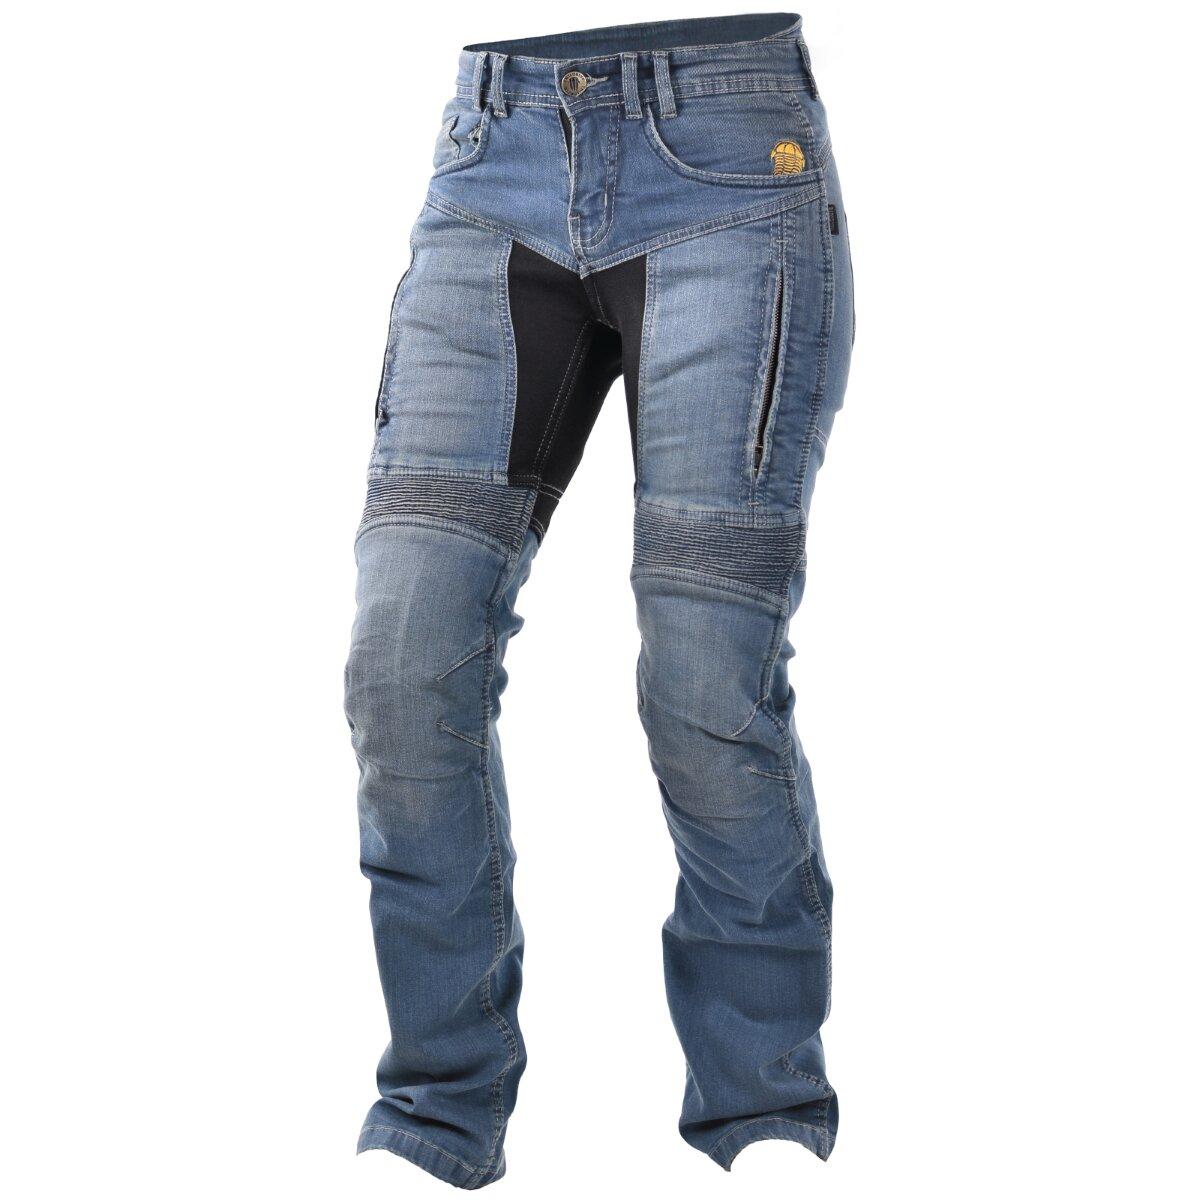 germot motorrad jeans parado blau damen langgr en wild. Black Bedroom Furniture Sets. Home Design Ideas